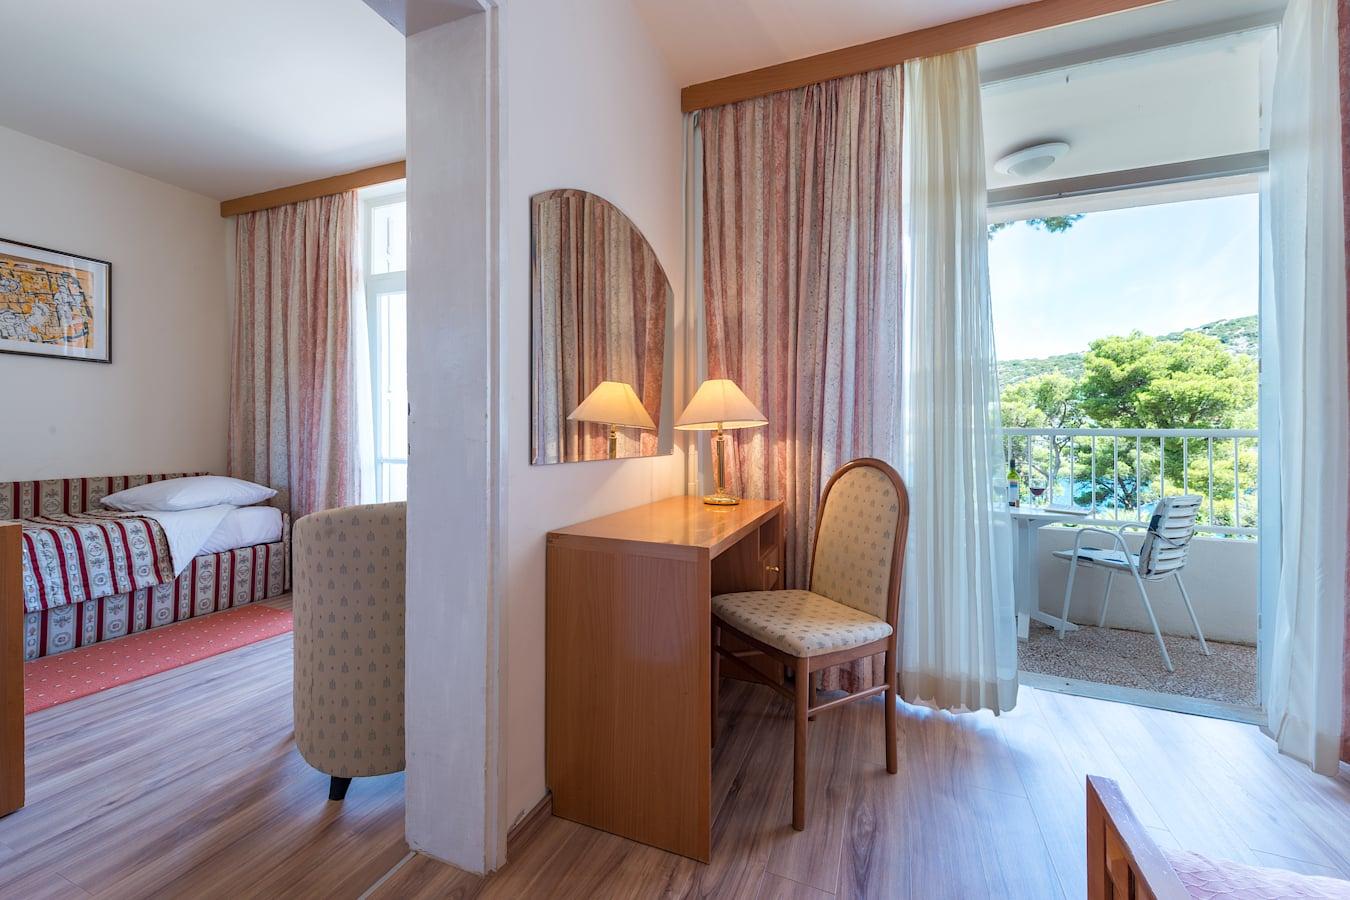 splendid-hotel-superior-room-balcony-seaview_1.jpg